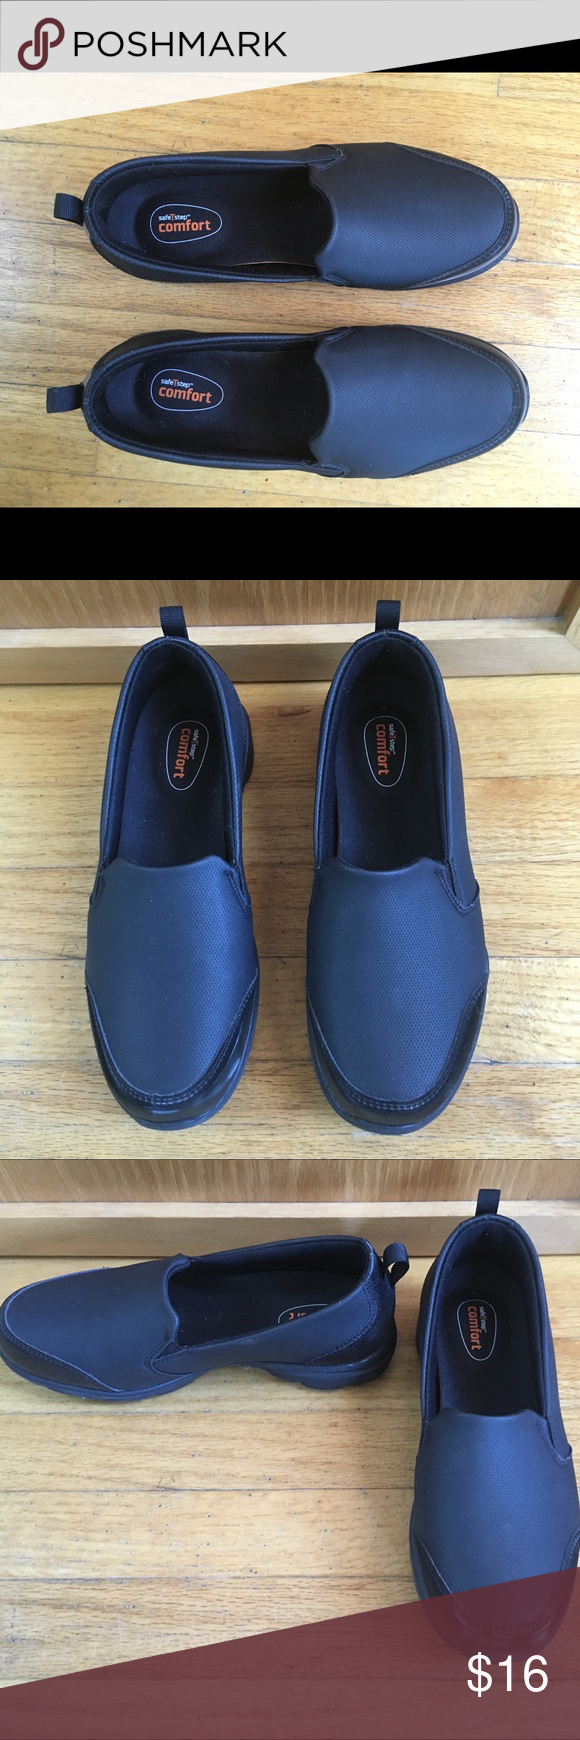 z river fw resistant black coil legend comforter product valley sr leather comfortable slip shoes